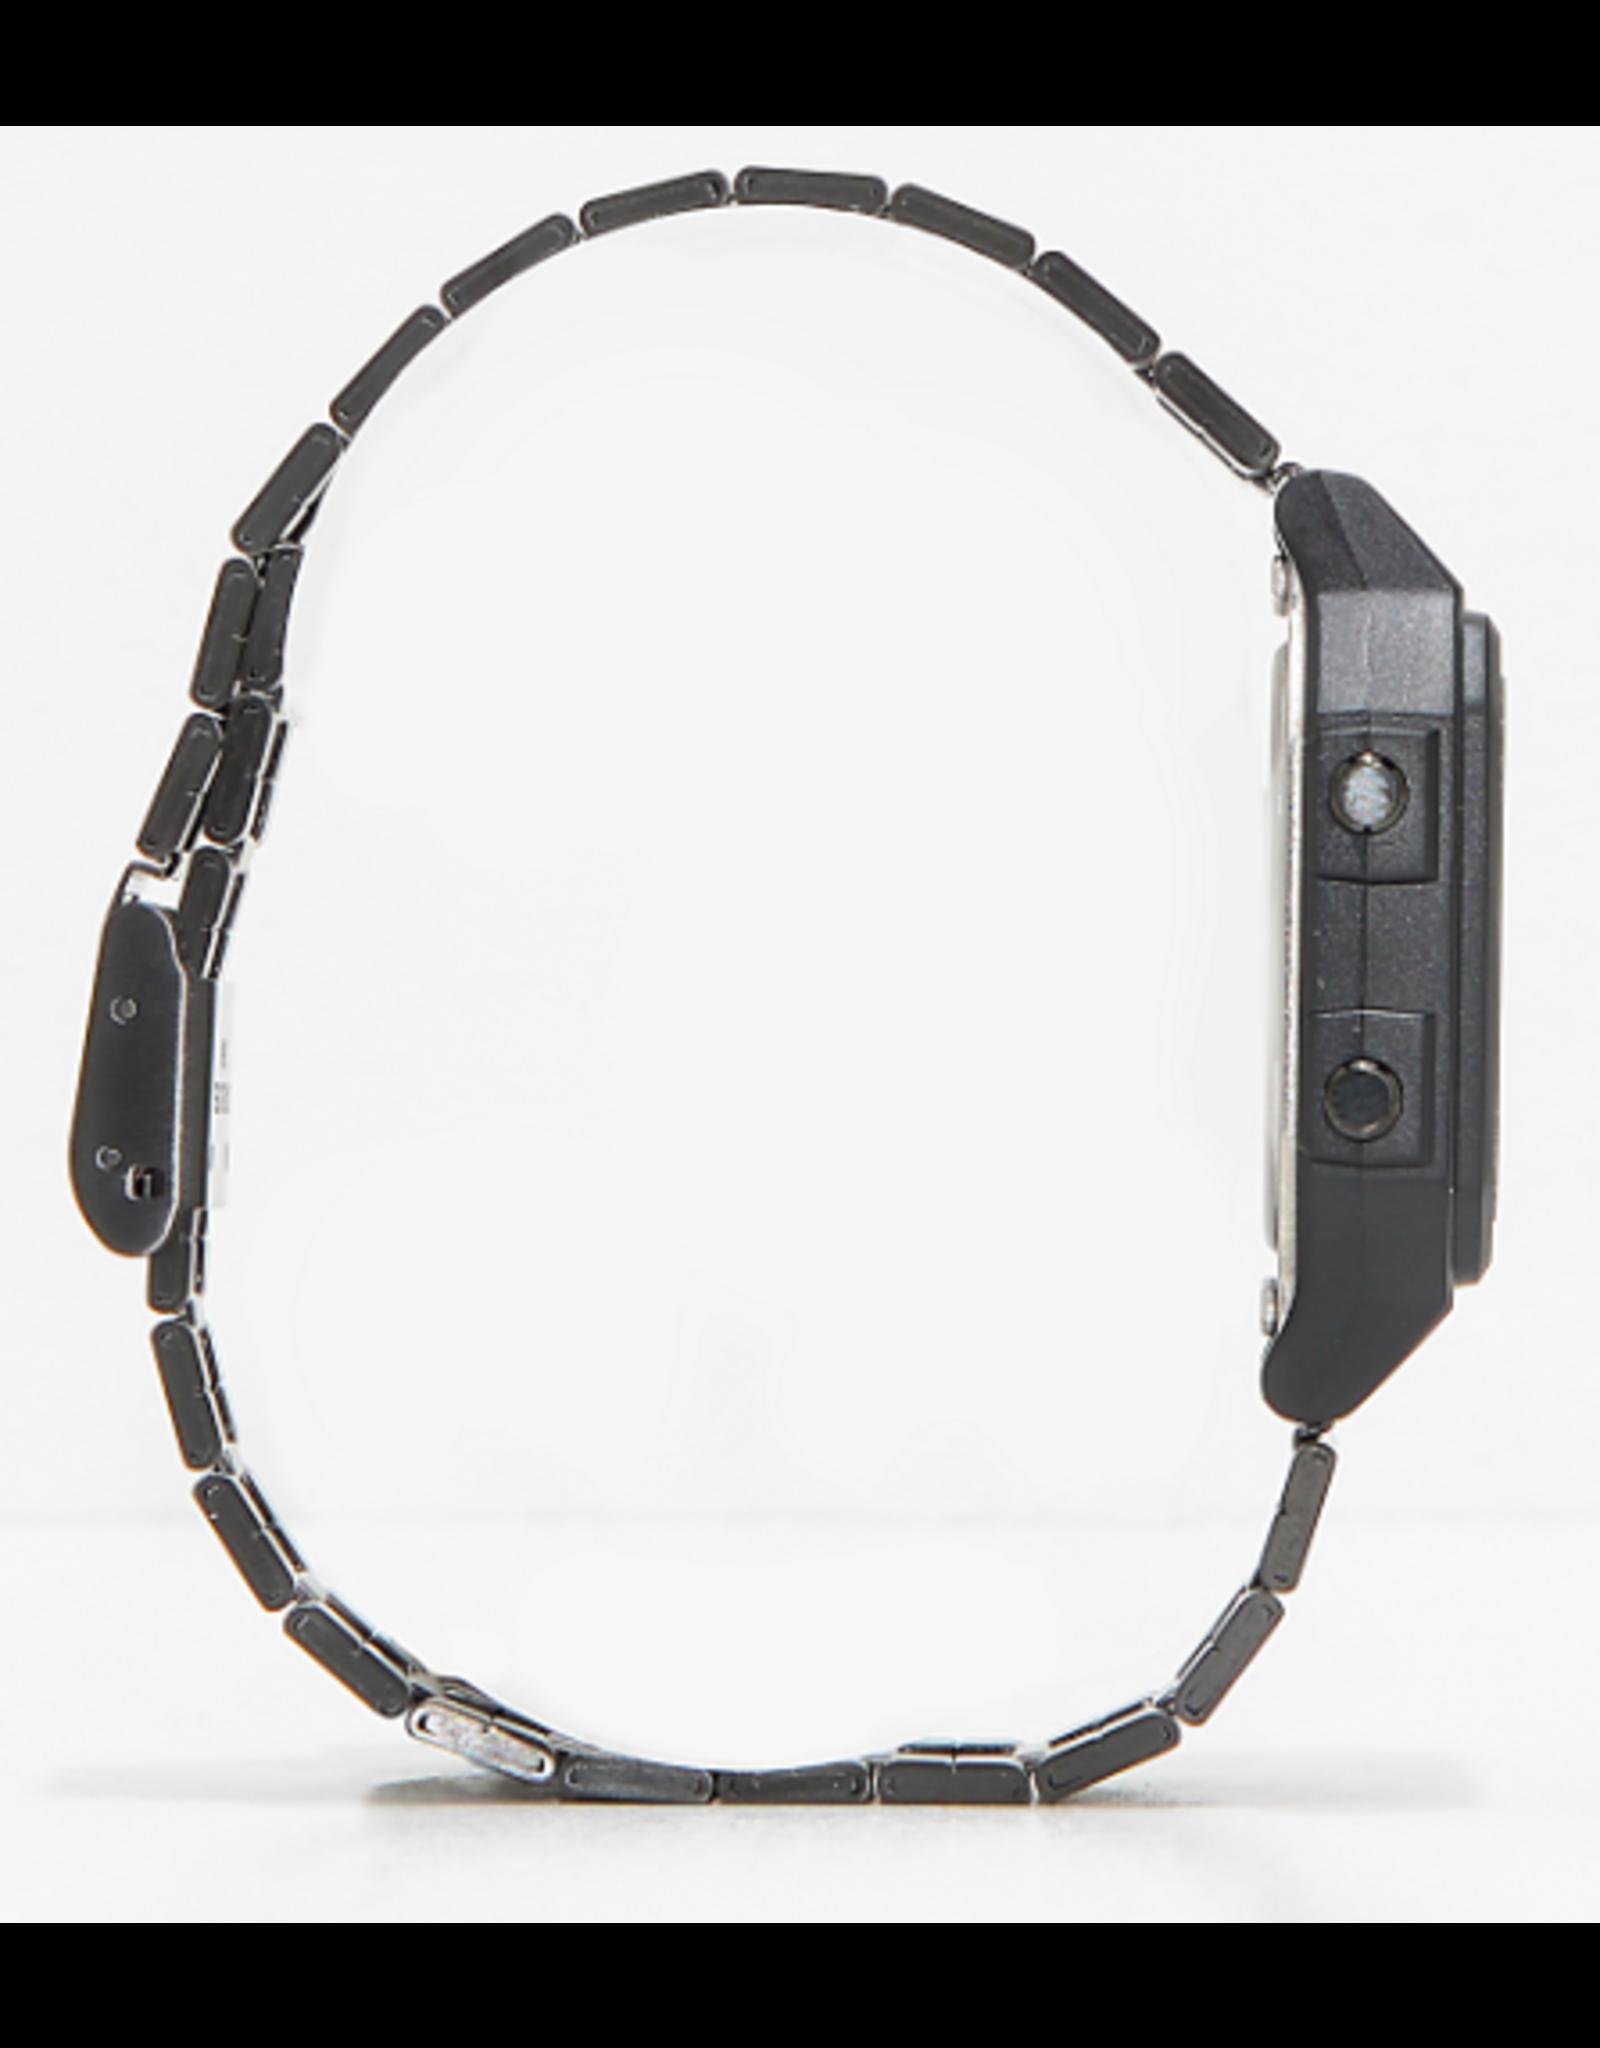 Casio B650WB-1BVT